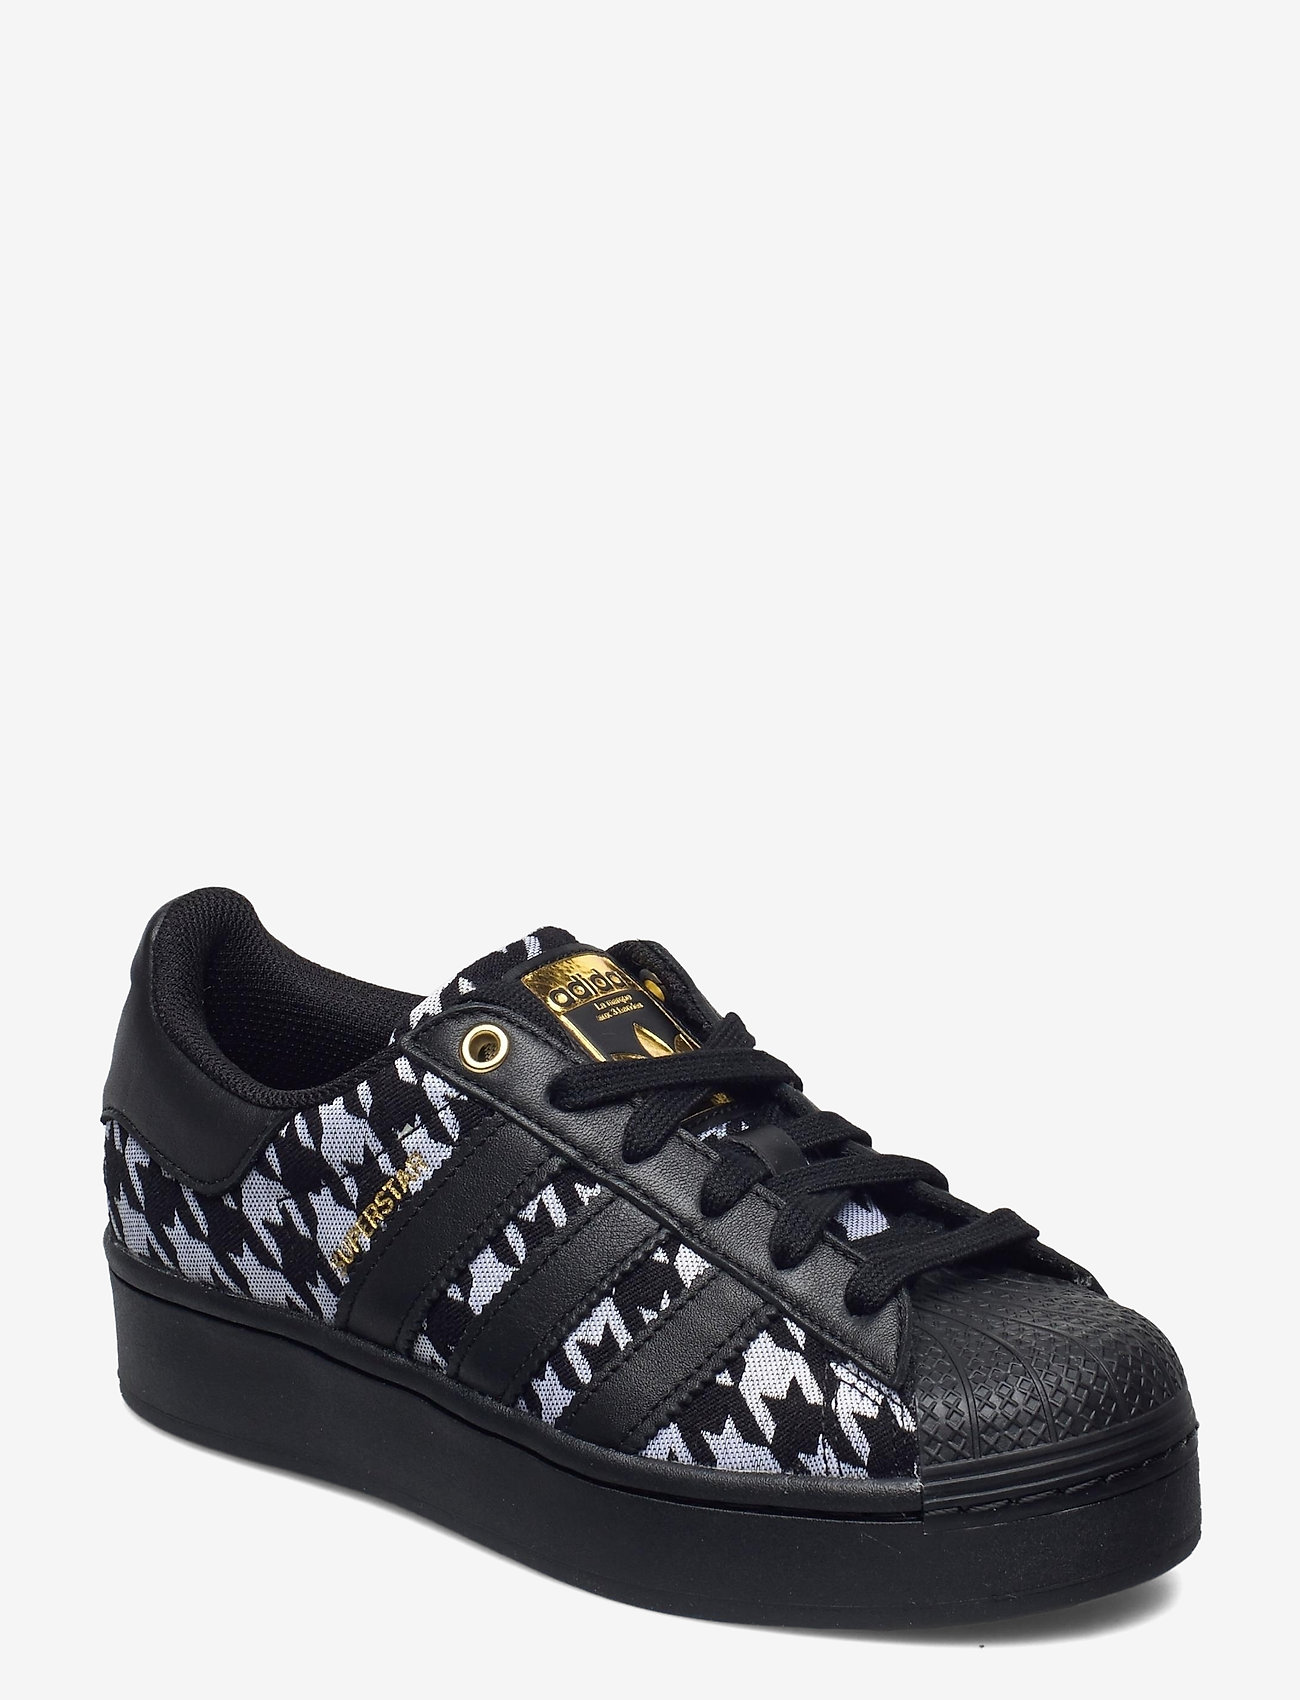 adidas Originals Superstar Bold W - Low top sneakers   Boozt.com